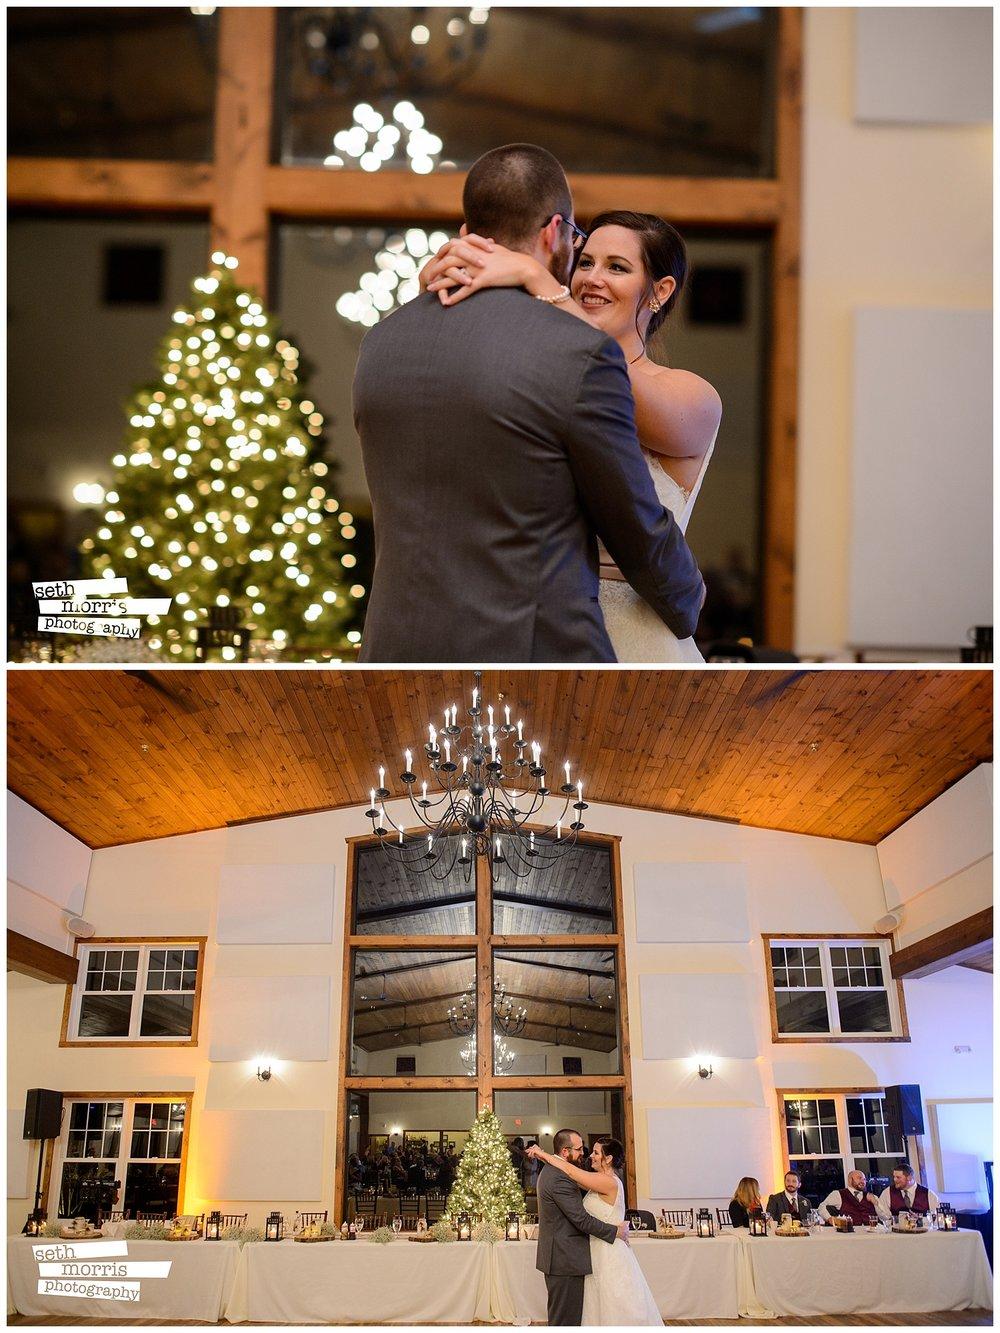 hornbaker-barn-princeton-il-wedding-photo-14.jpg